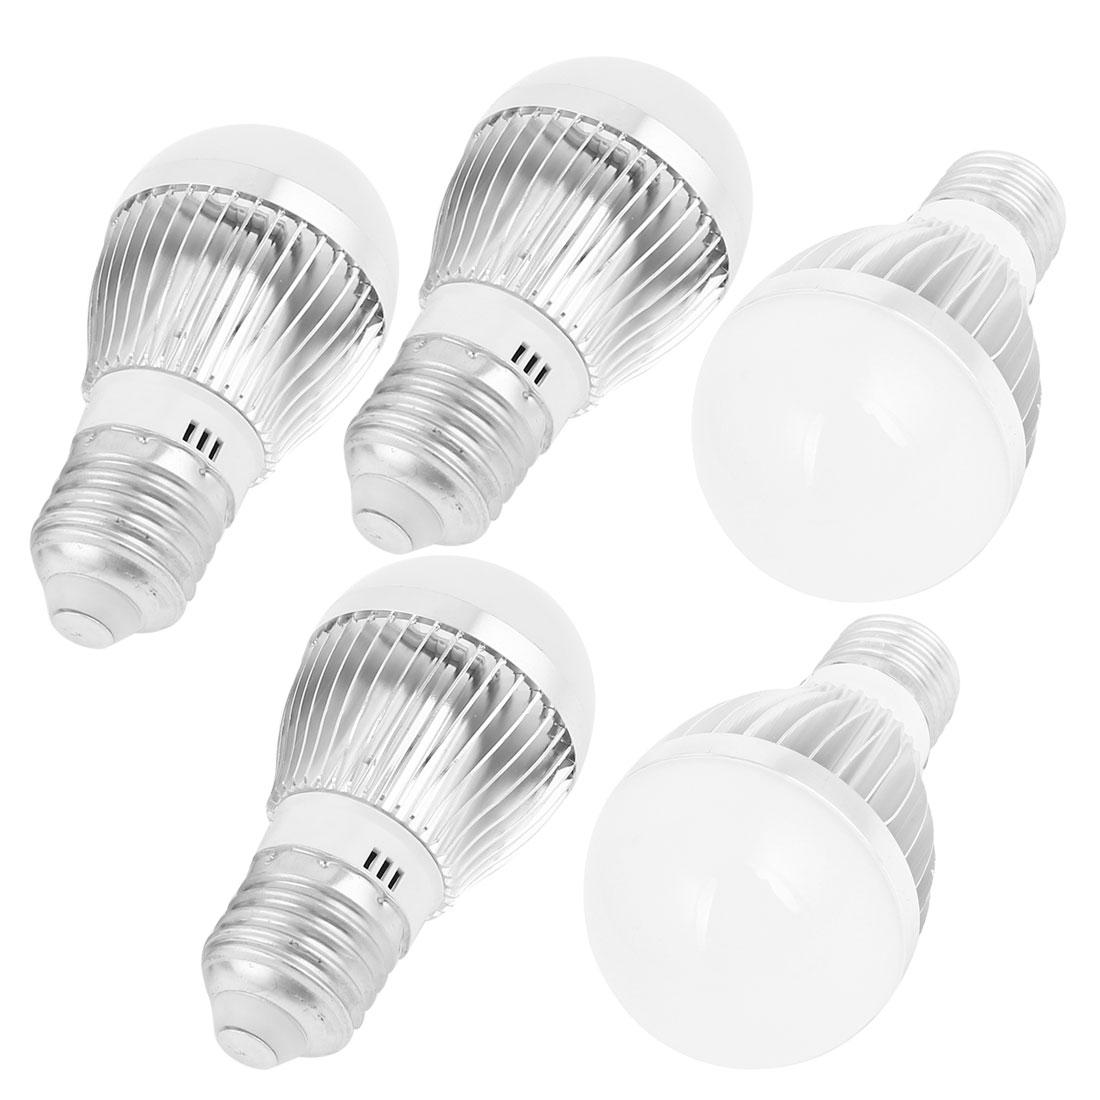 AC 220V 3W E27 SMD 5730 White LED Light Globe Bulb Lighting Fixtures 5 Pcs